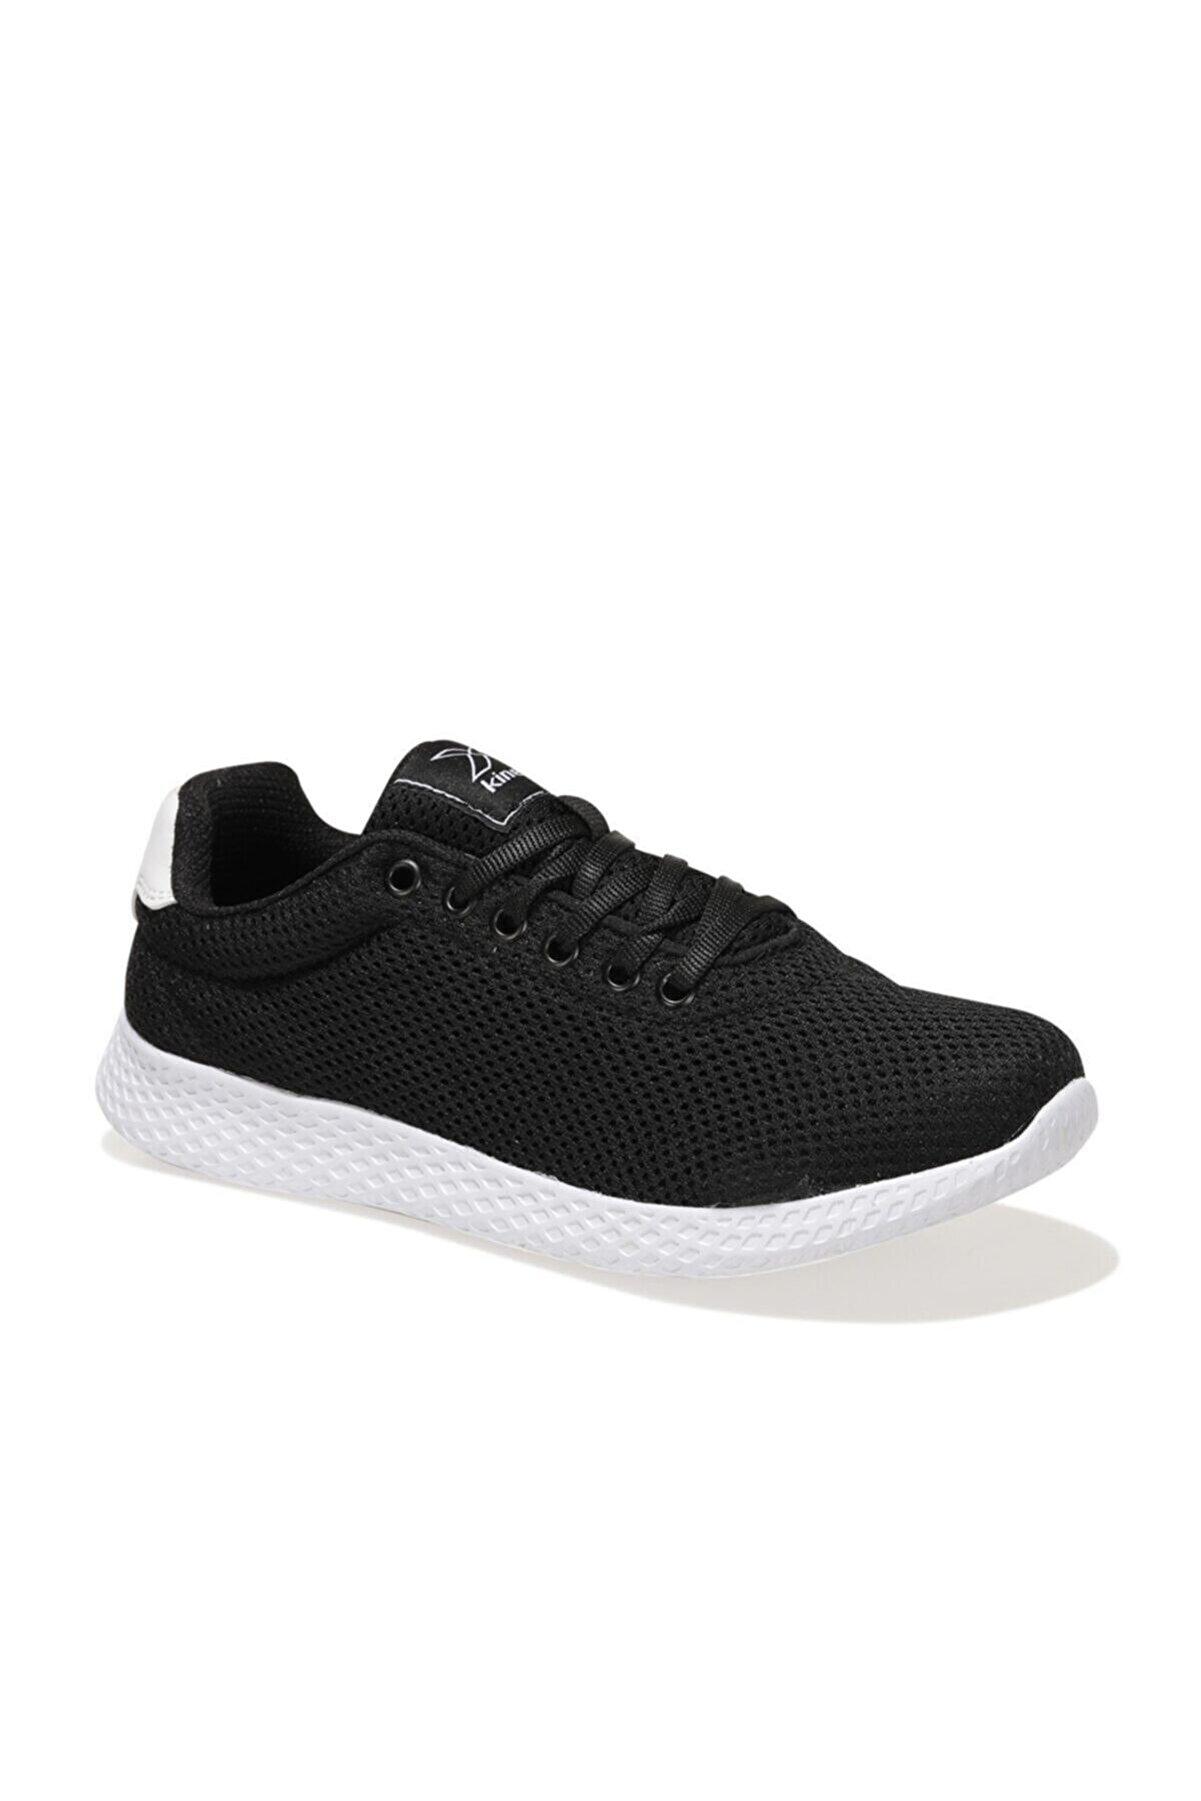 Kinetix AREL MESH M 1FX Siyah Erkek Sneaker Ayakkabı 100781977